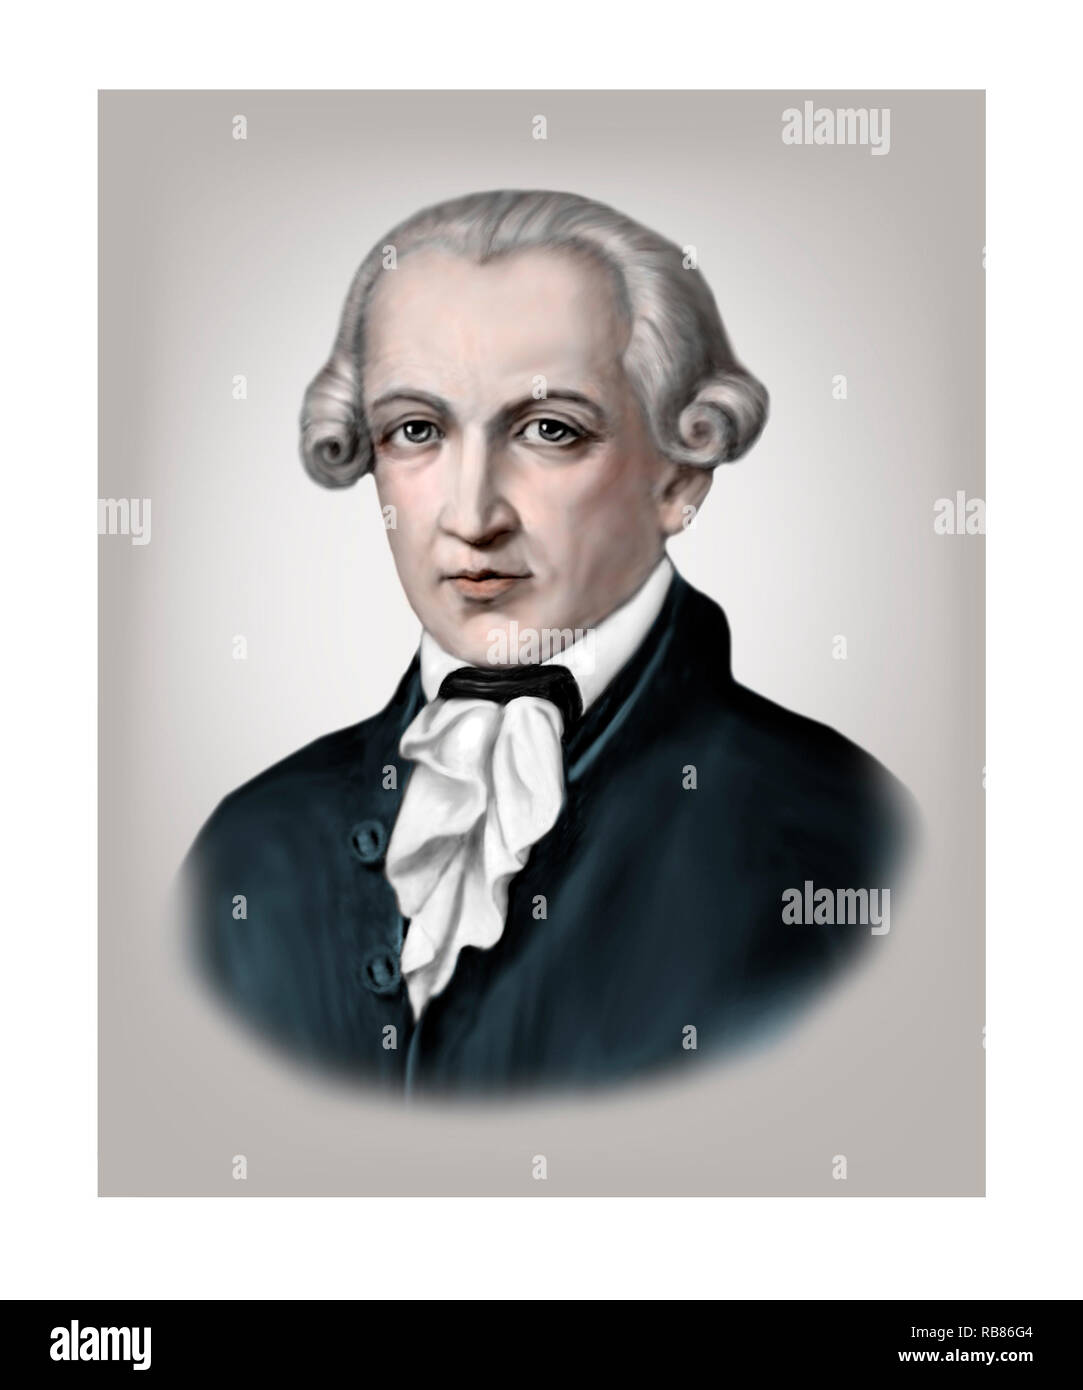 Immanuel Kant 1724-1804 filosofo tedesco Immagini Stock